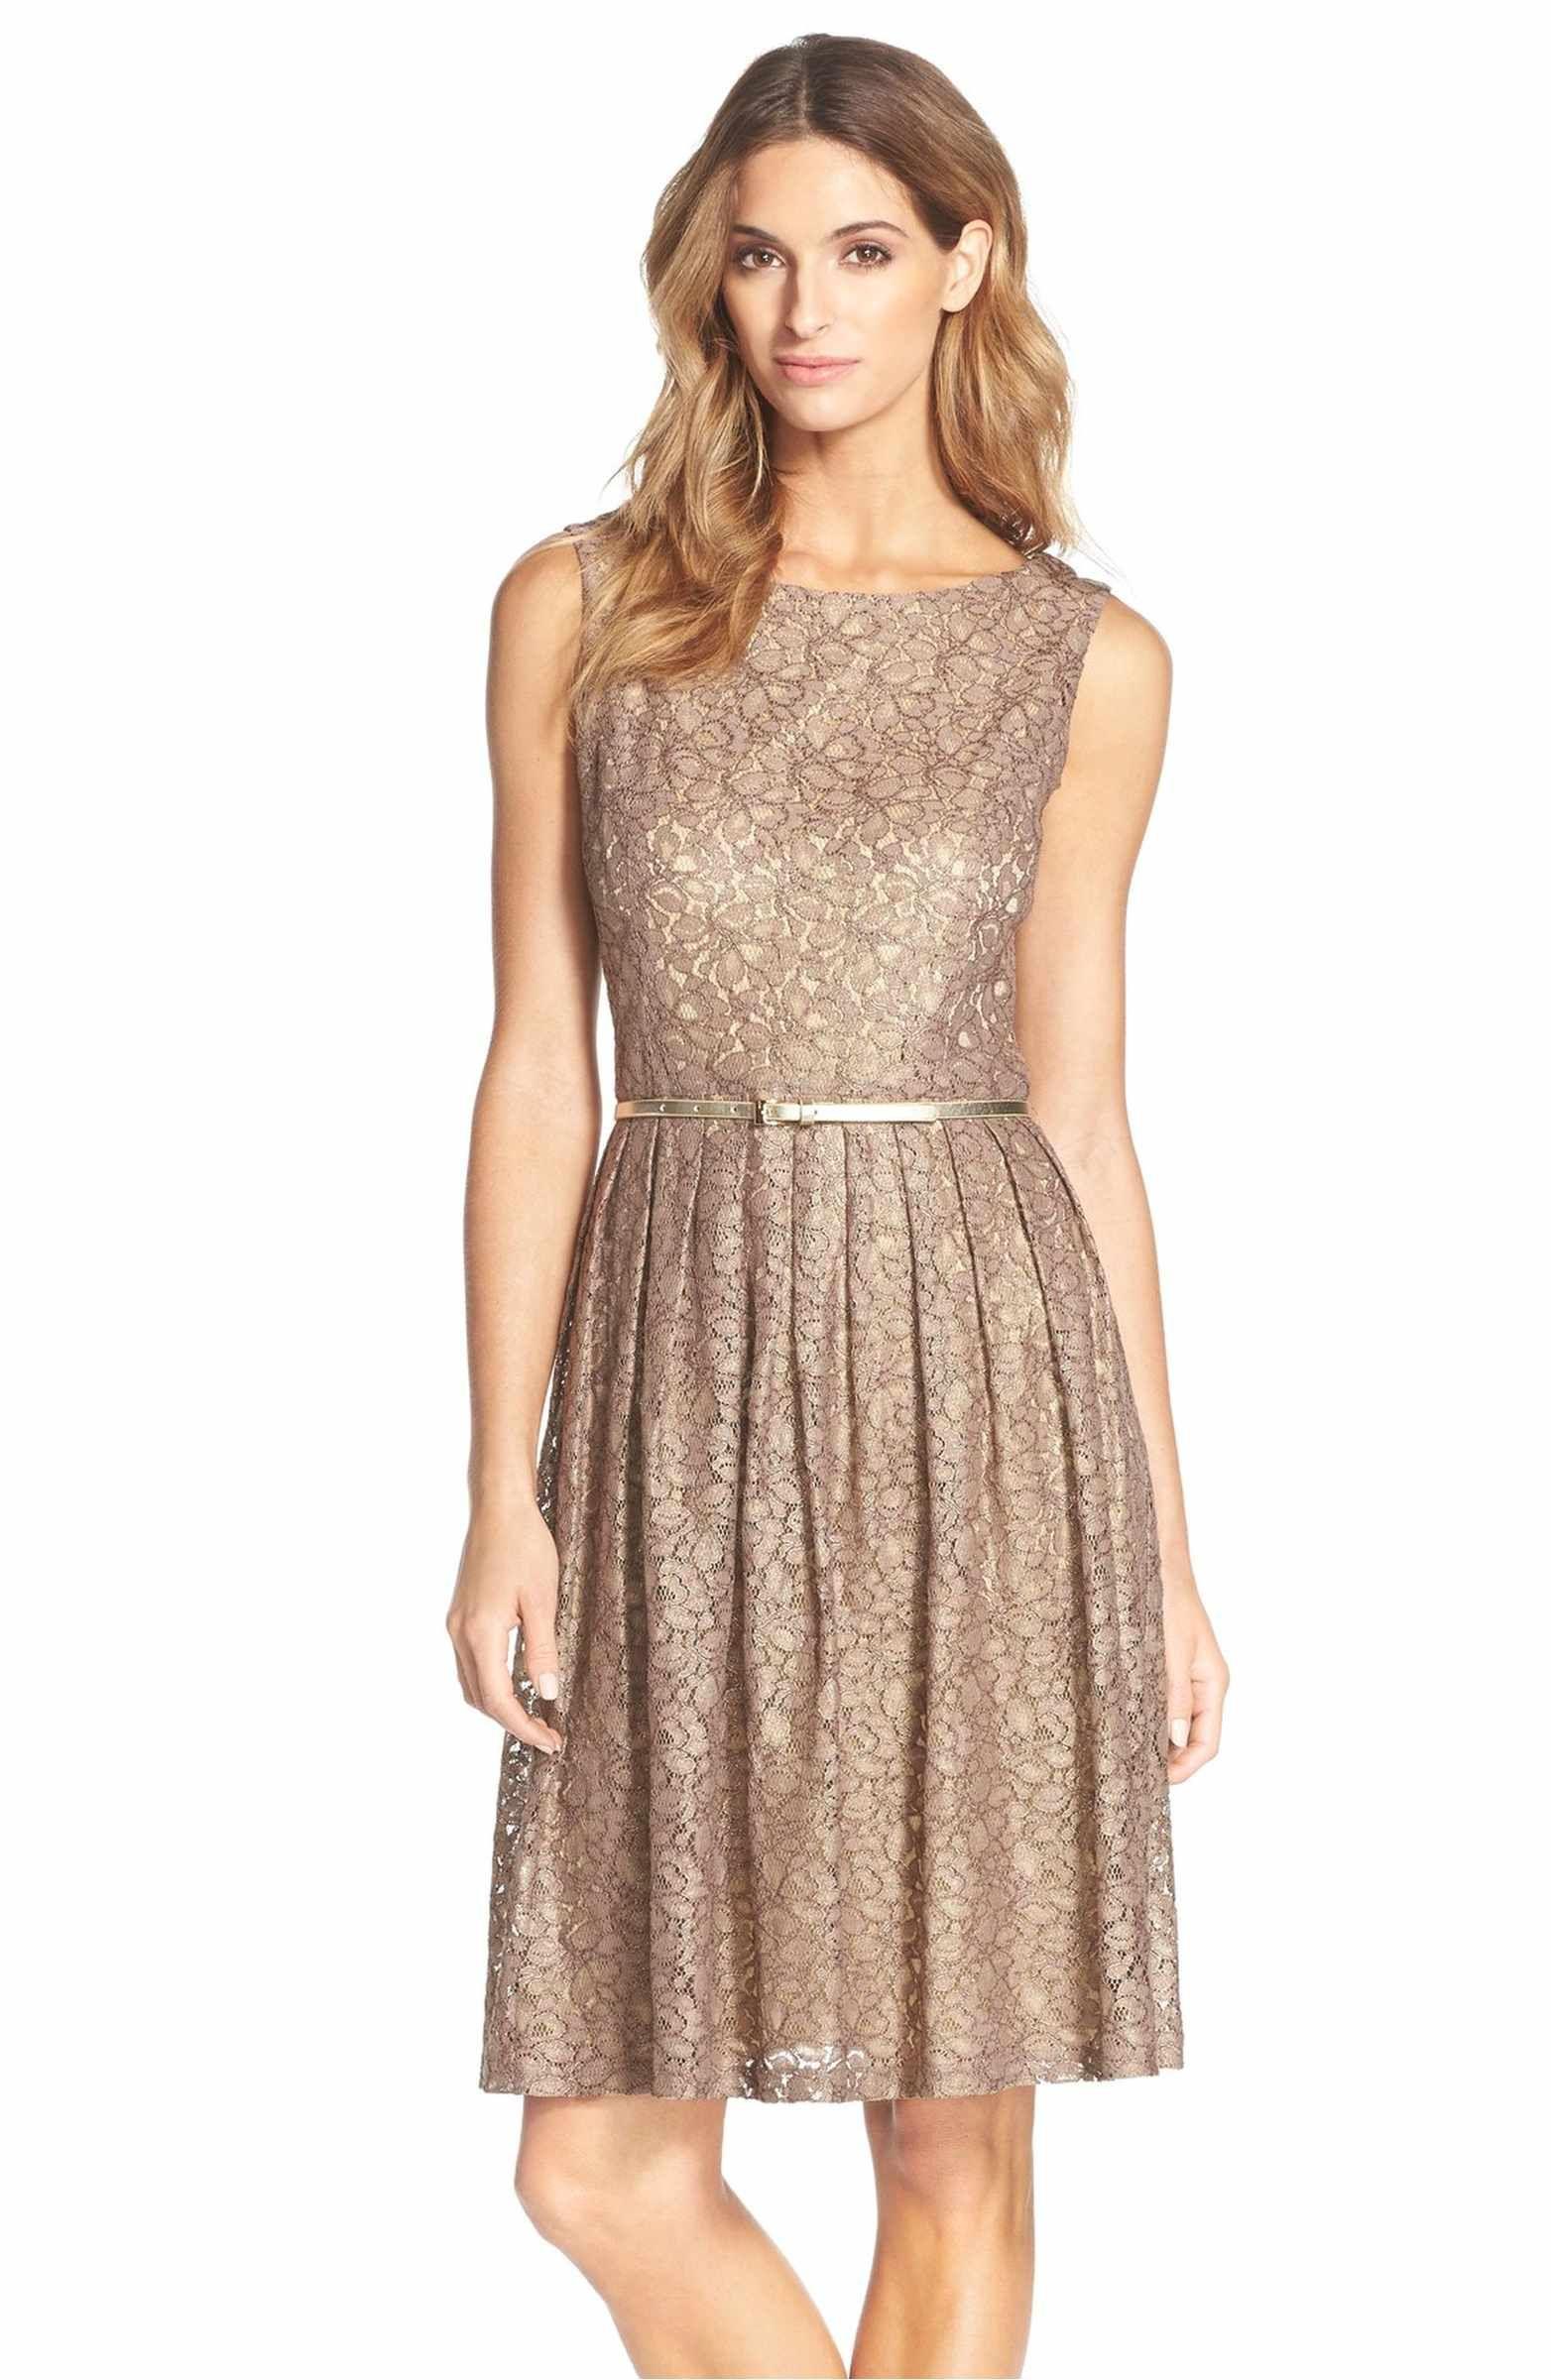 Main image ellen tracy pleated lace fit u flare dress regular